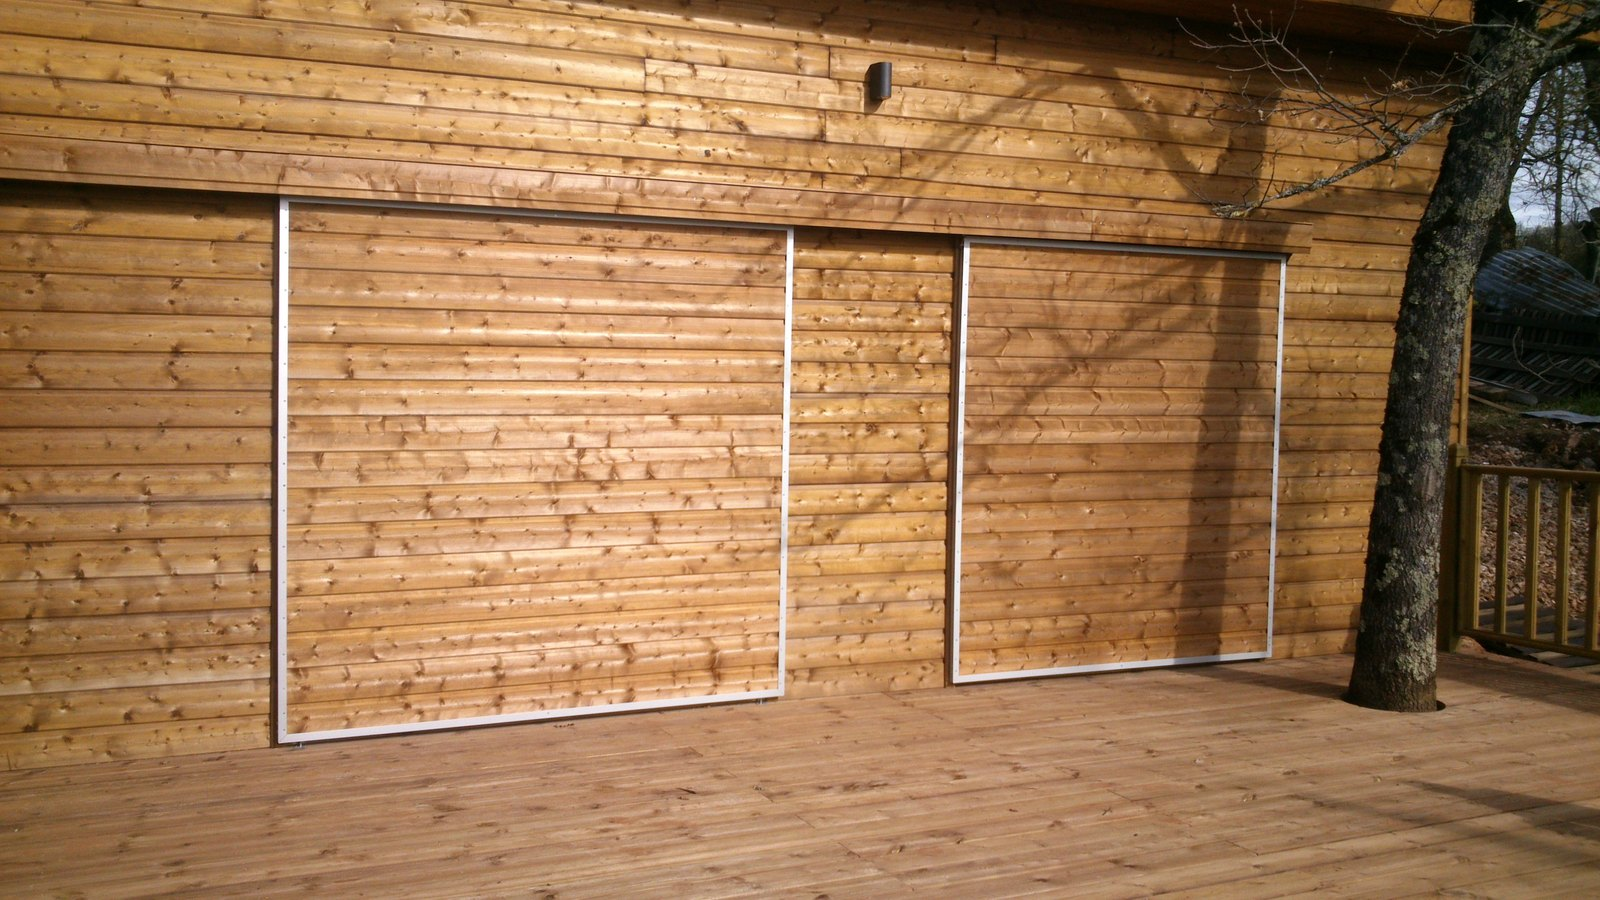 extension maison en ossature bois. Black Bedroom Furniture Sets. Home Design Ideas